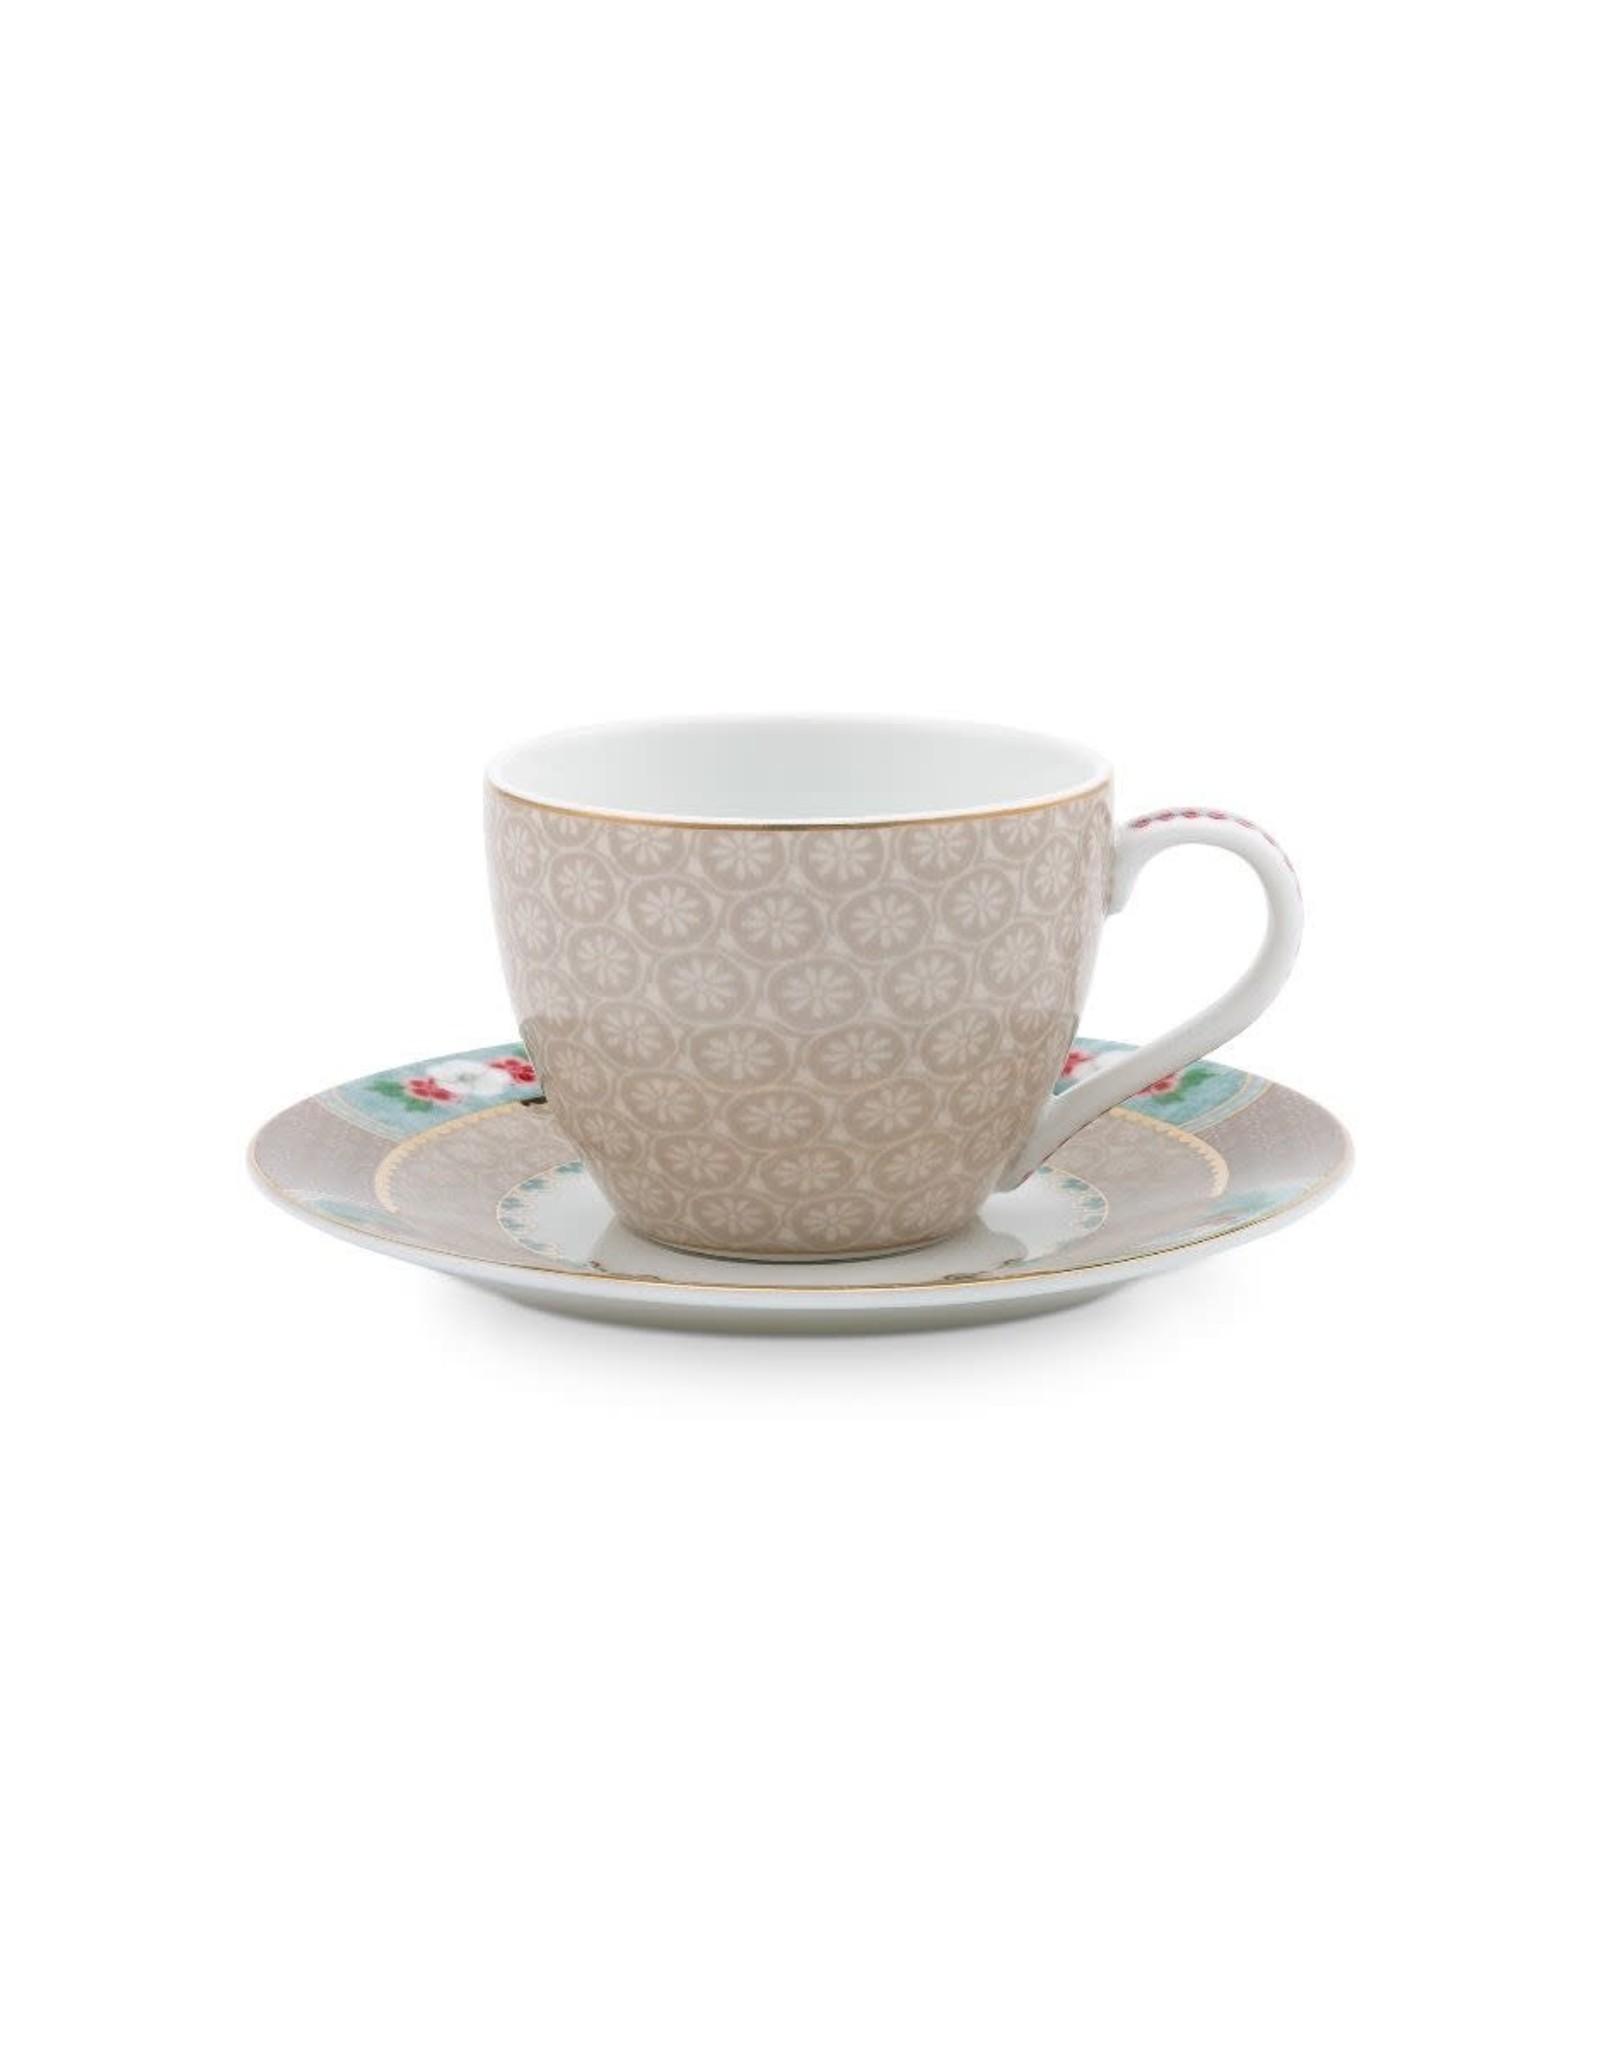 pip-studio Espresso Cup & Saucer Blushing Birds Khaki 120ml